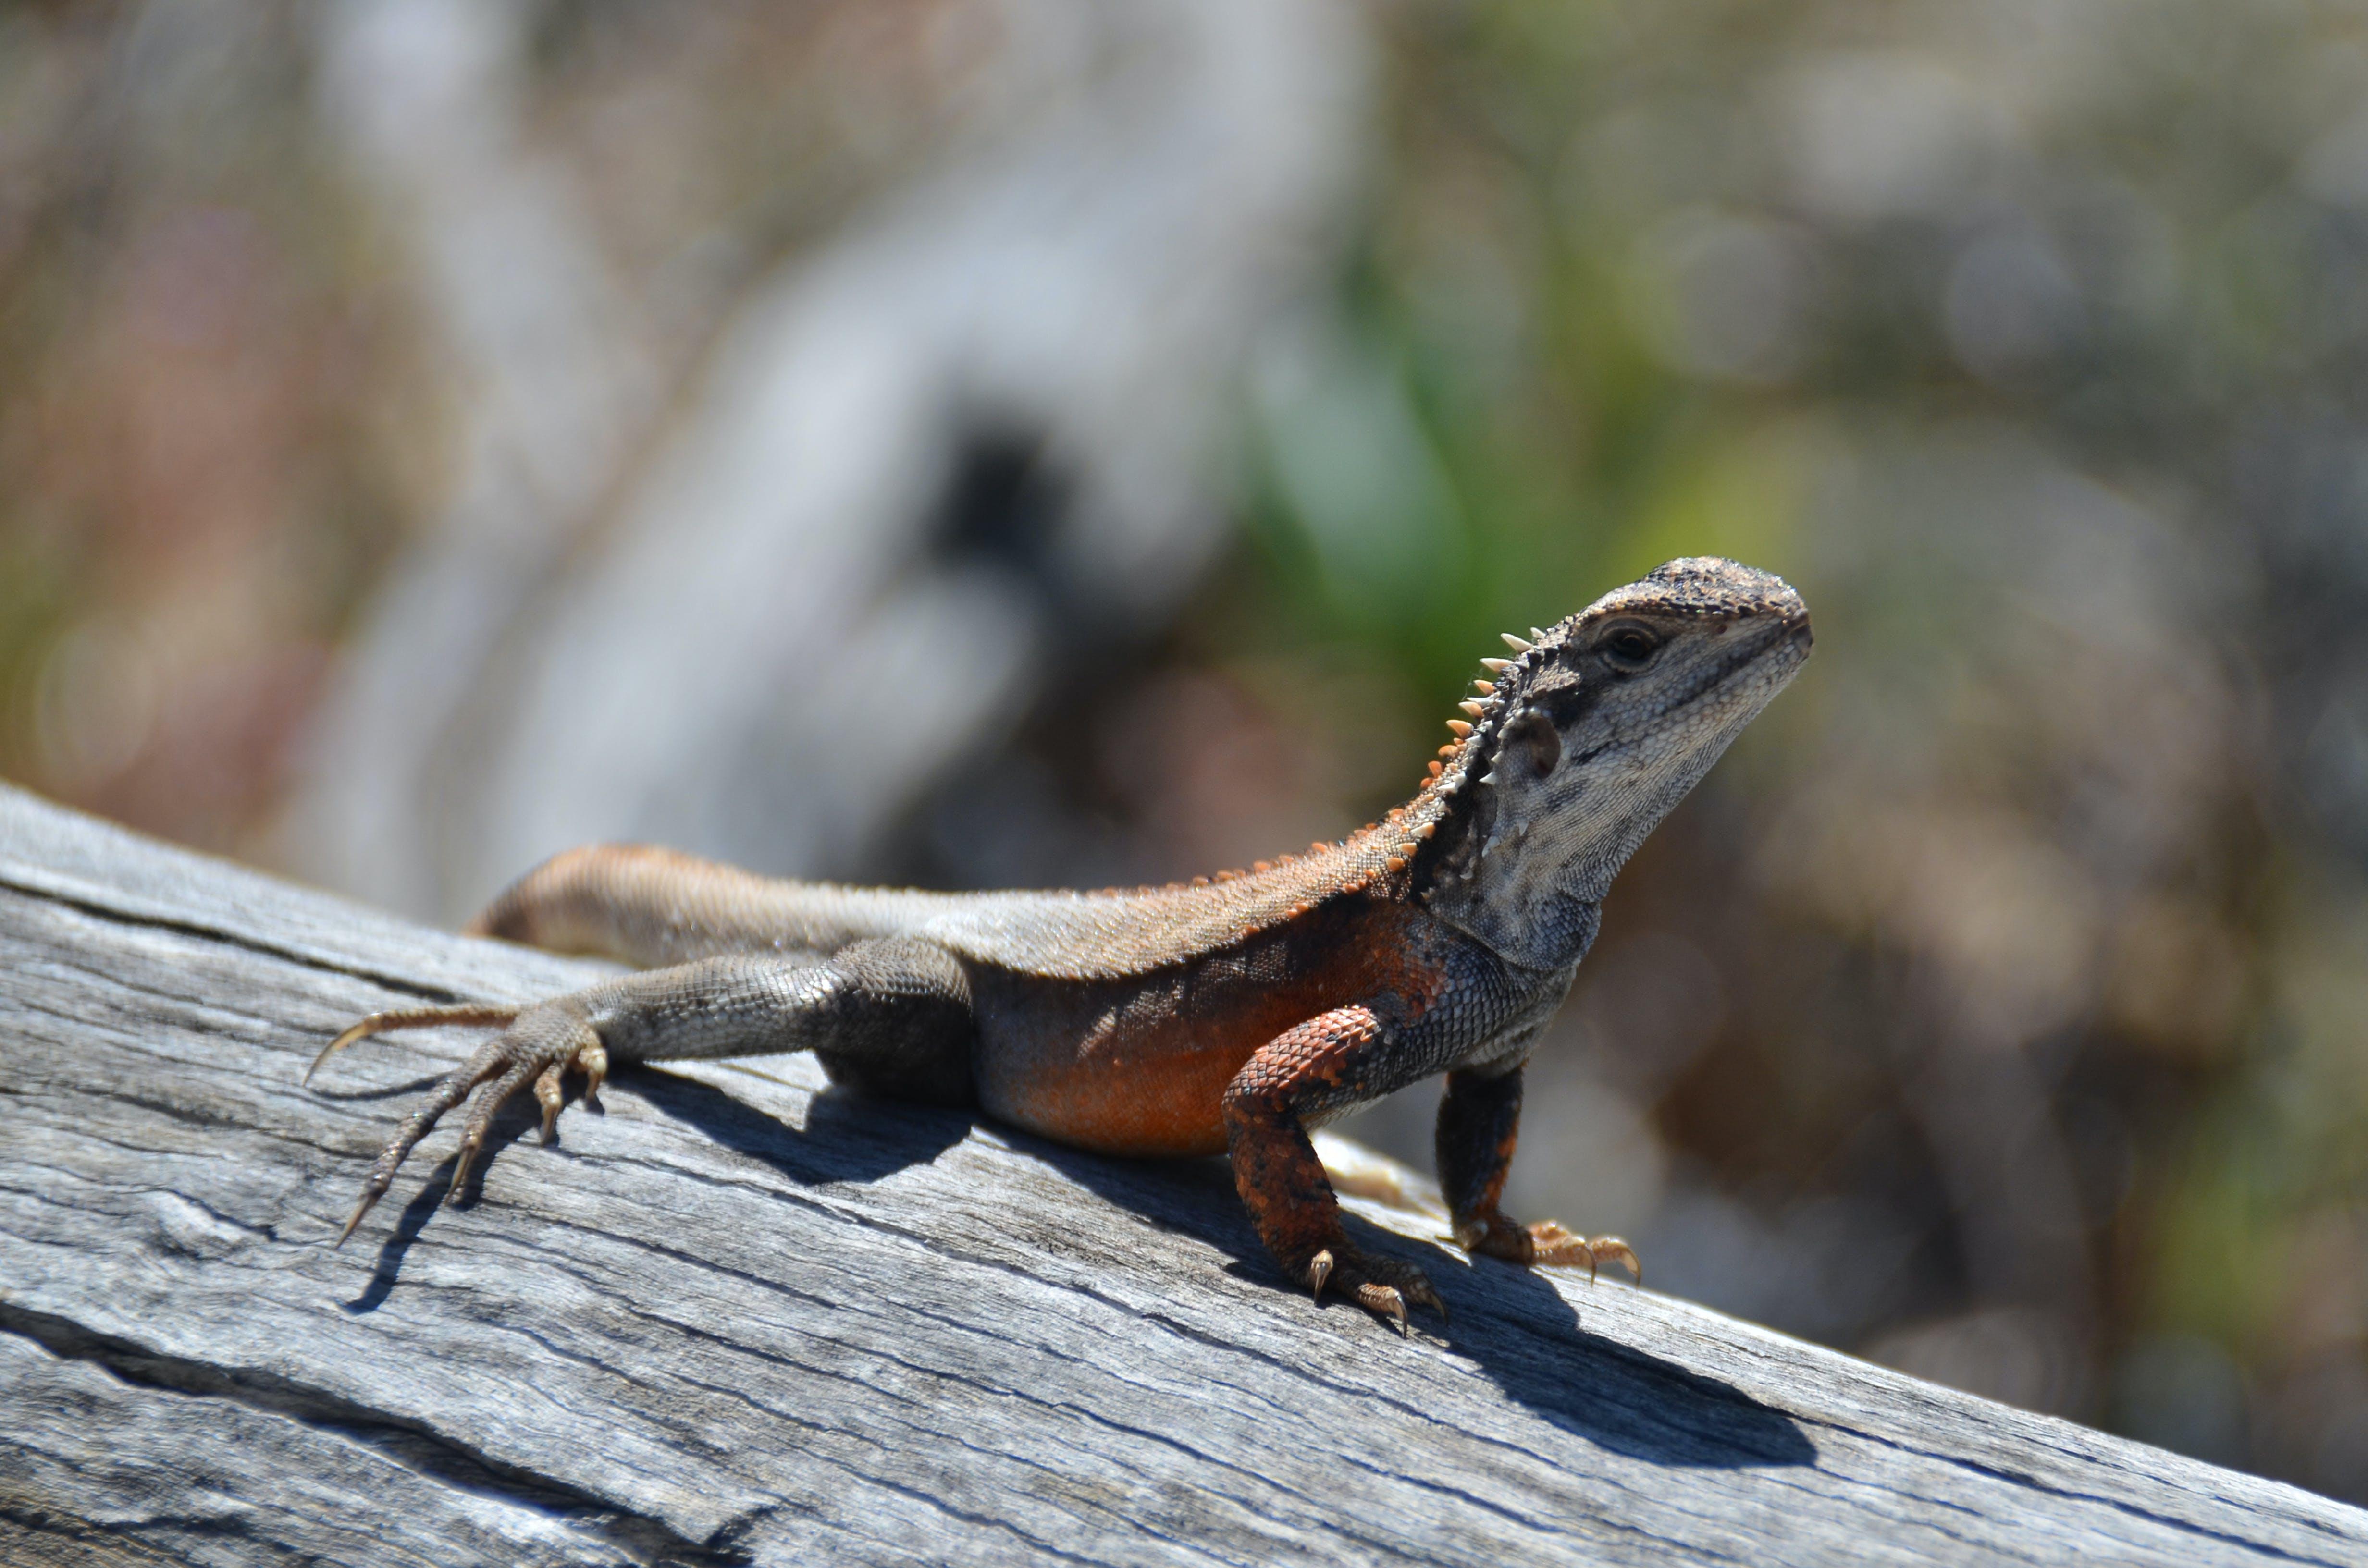 Free stock photo of australia, reptile, lizard sunning itself on timber log